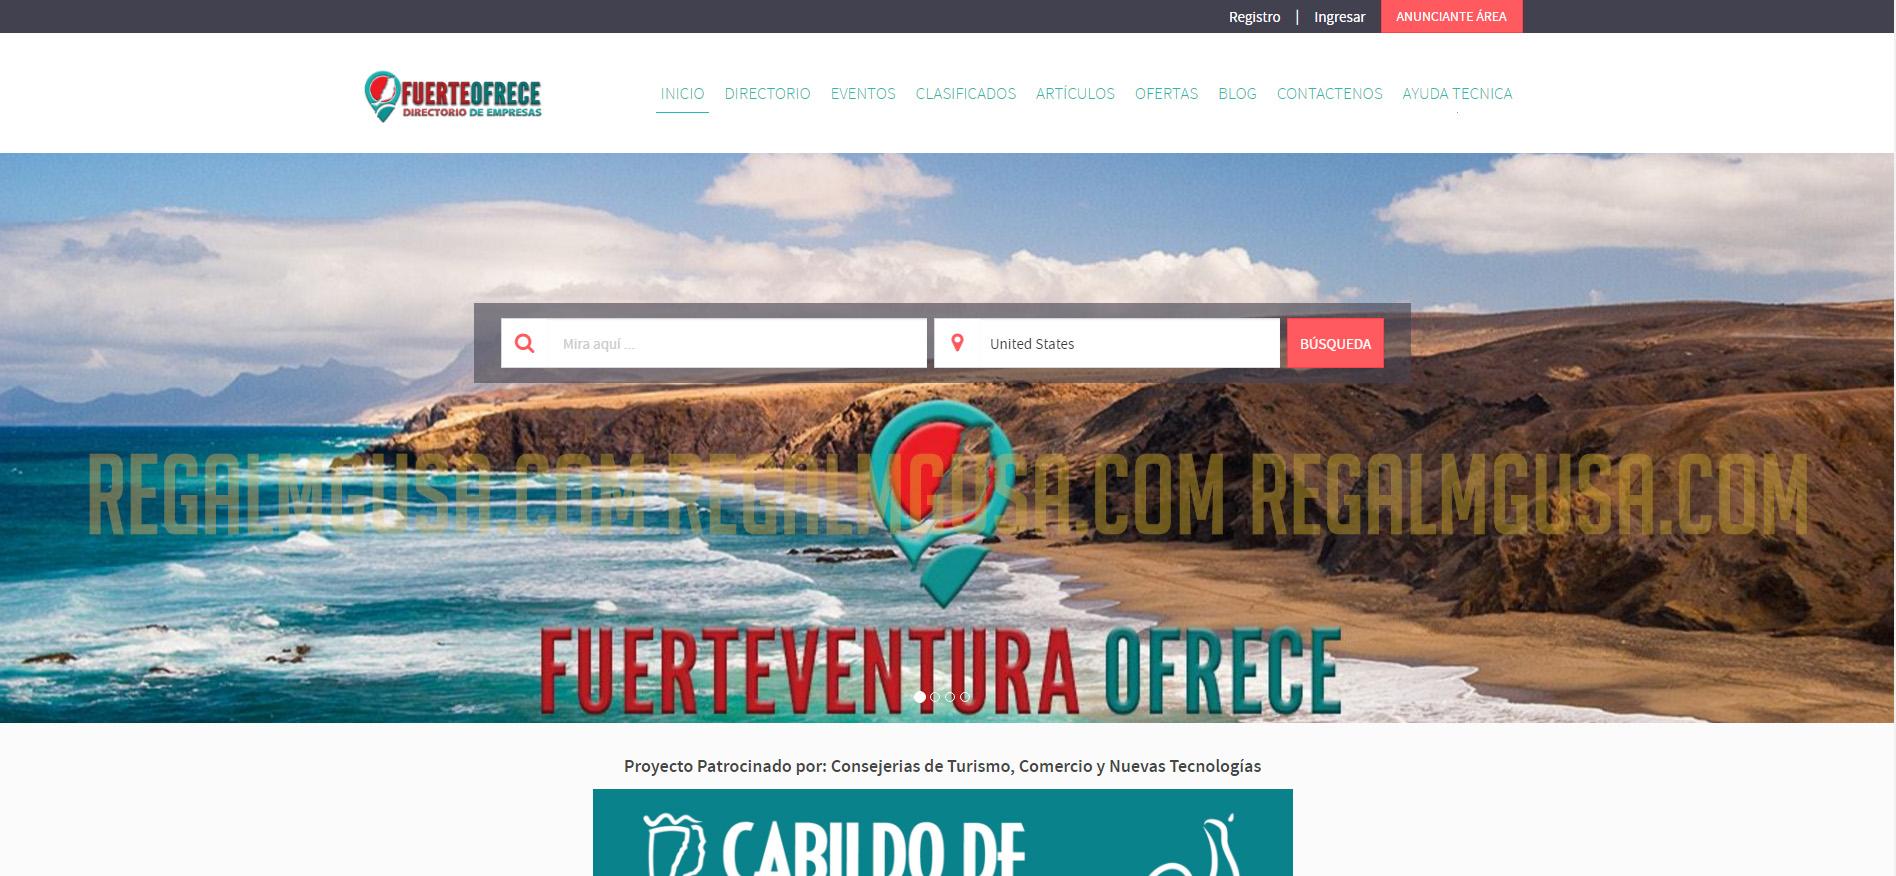 Fuerte Ofrece Regal MG Ecommerce Website Screenshot 002